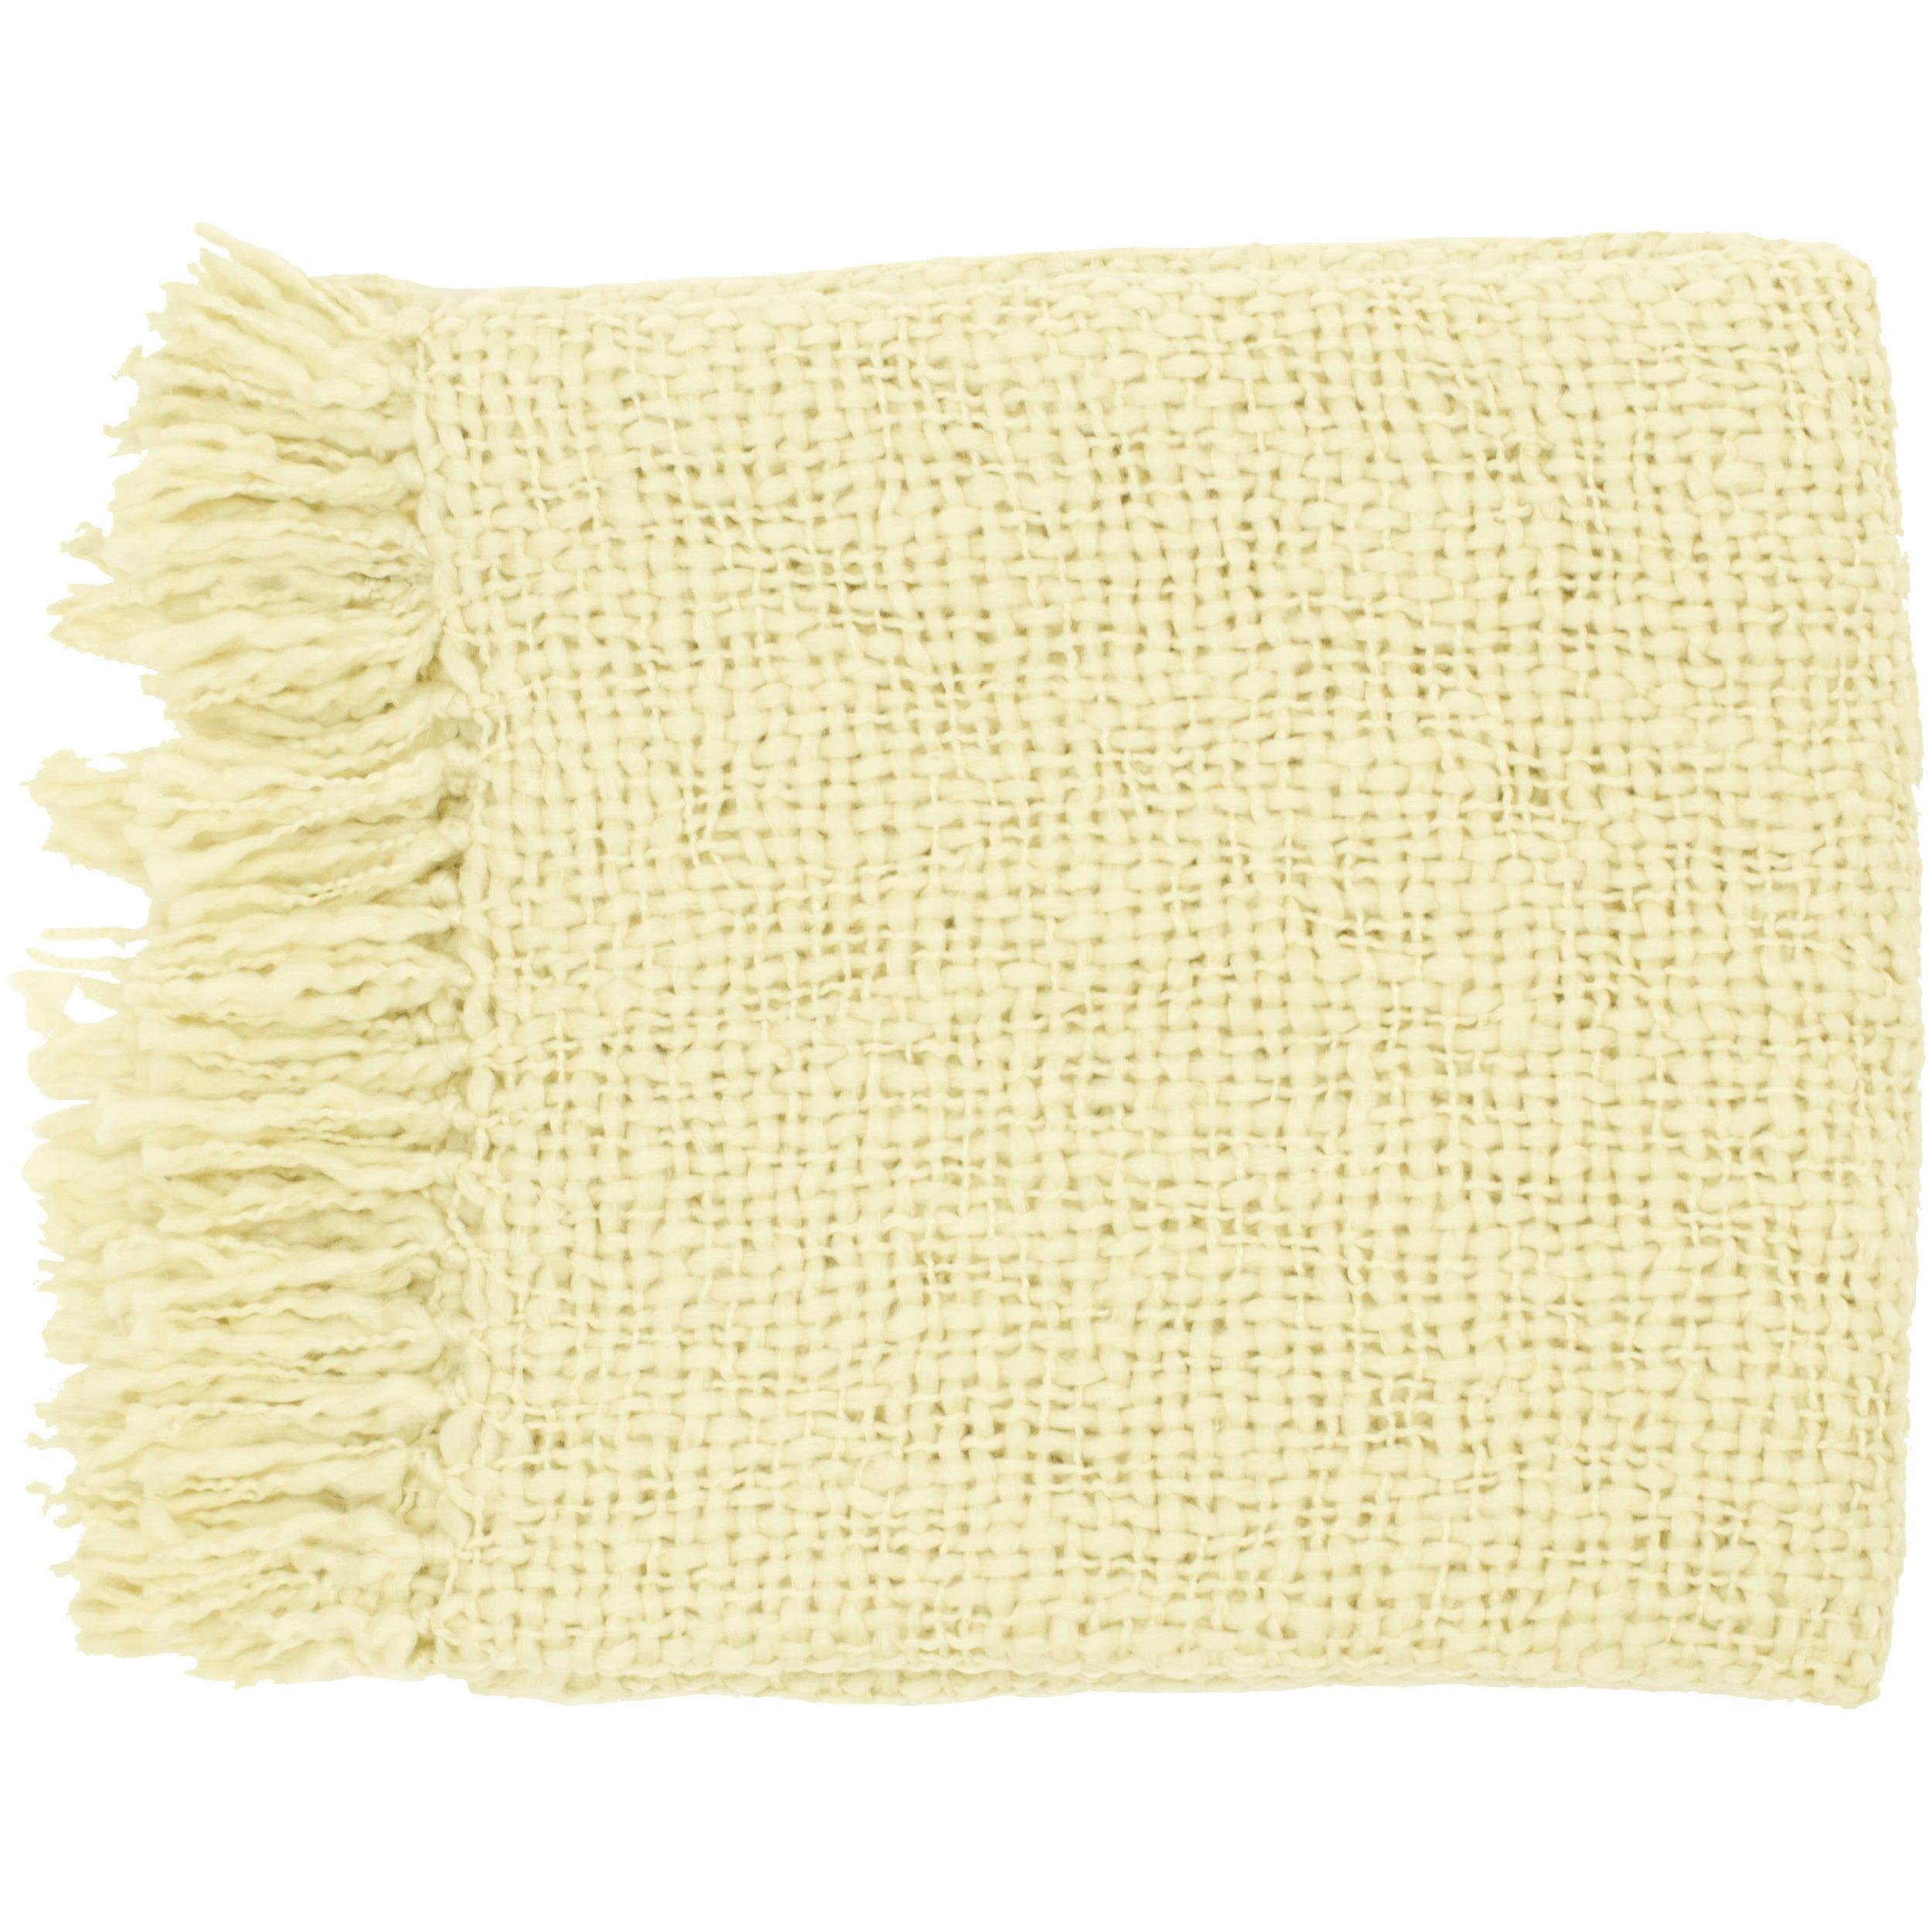 Woven Carnegie Acrylic and Wool Throw Blanket